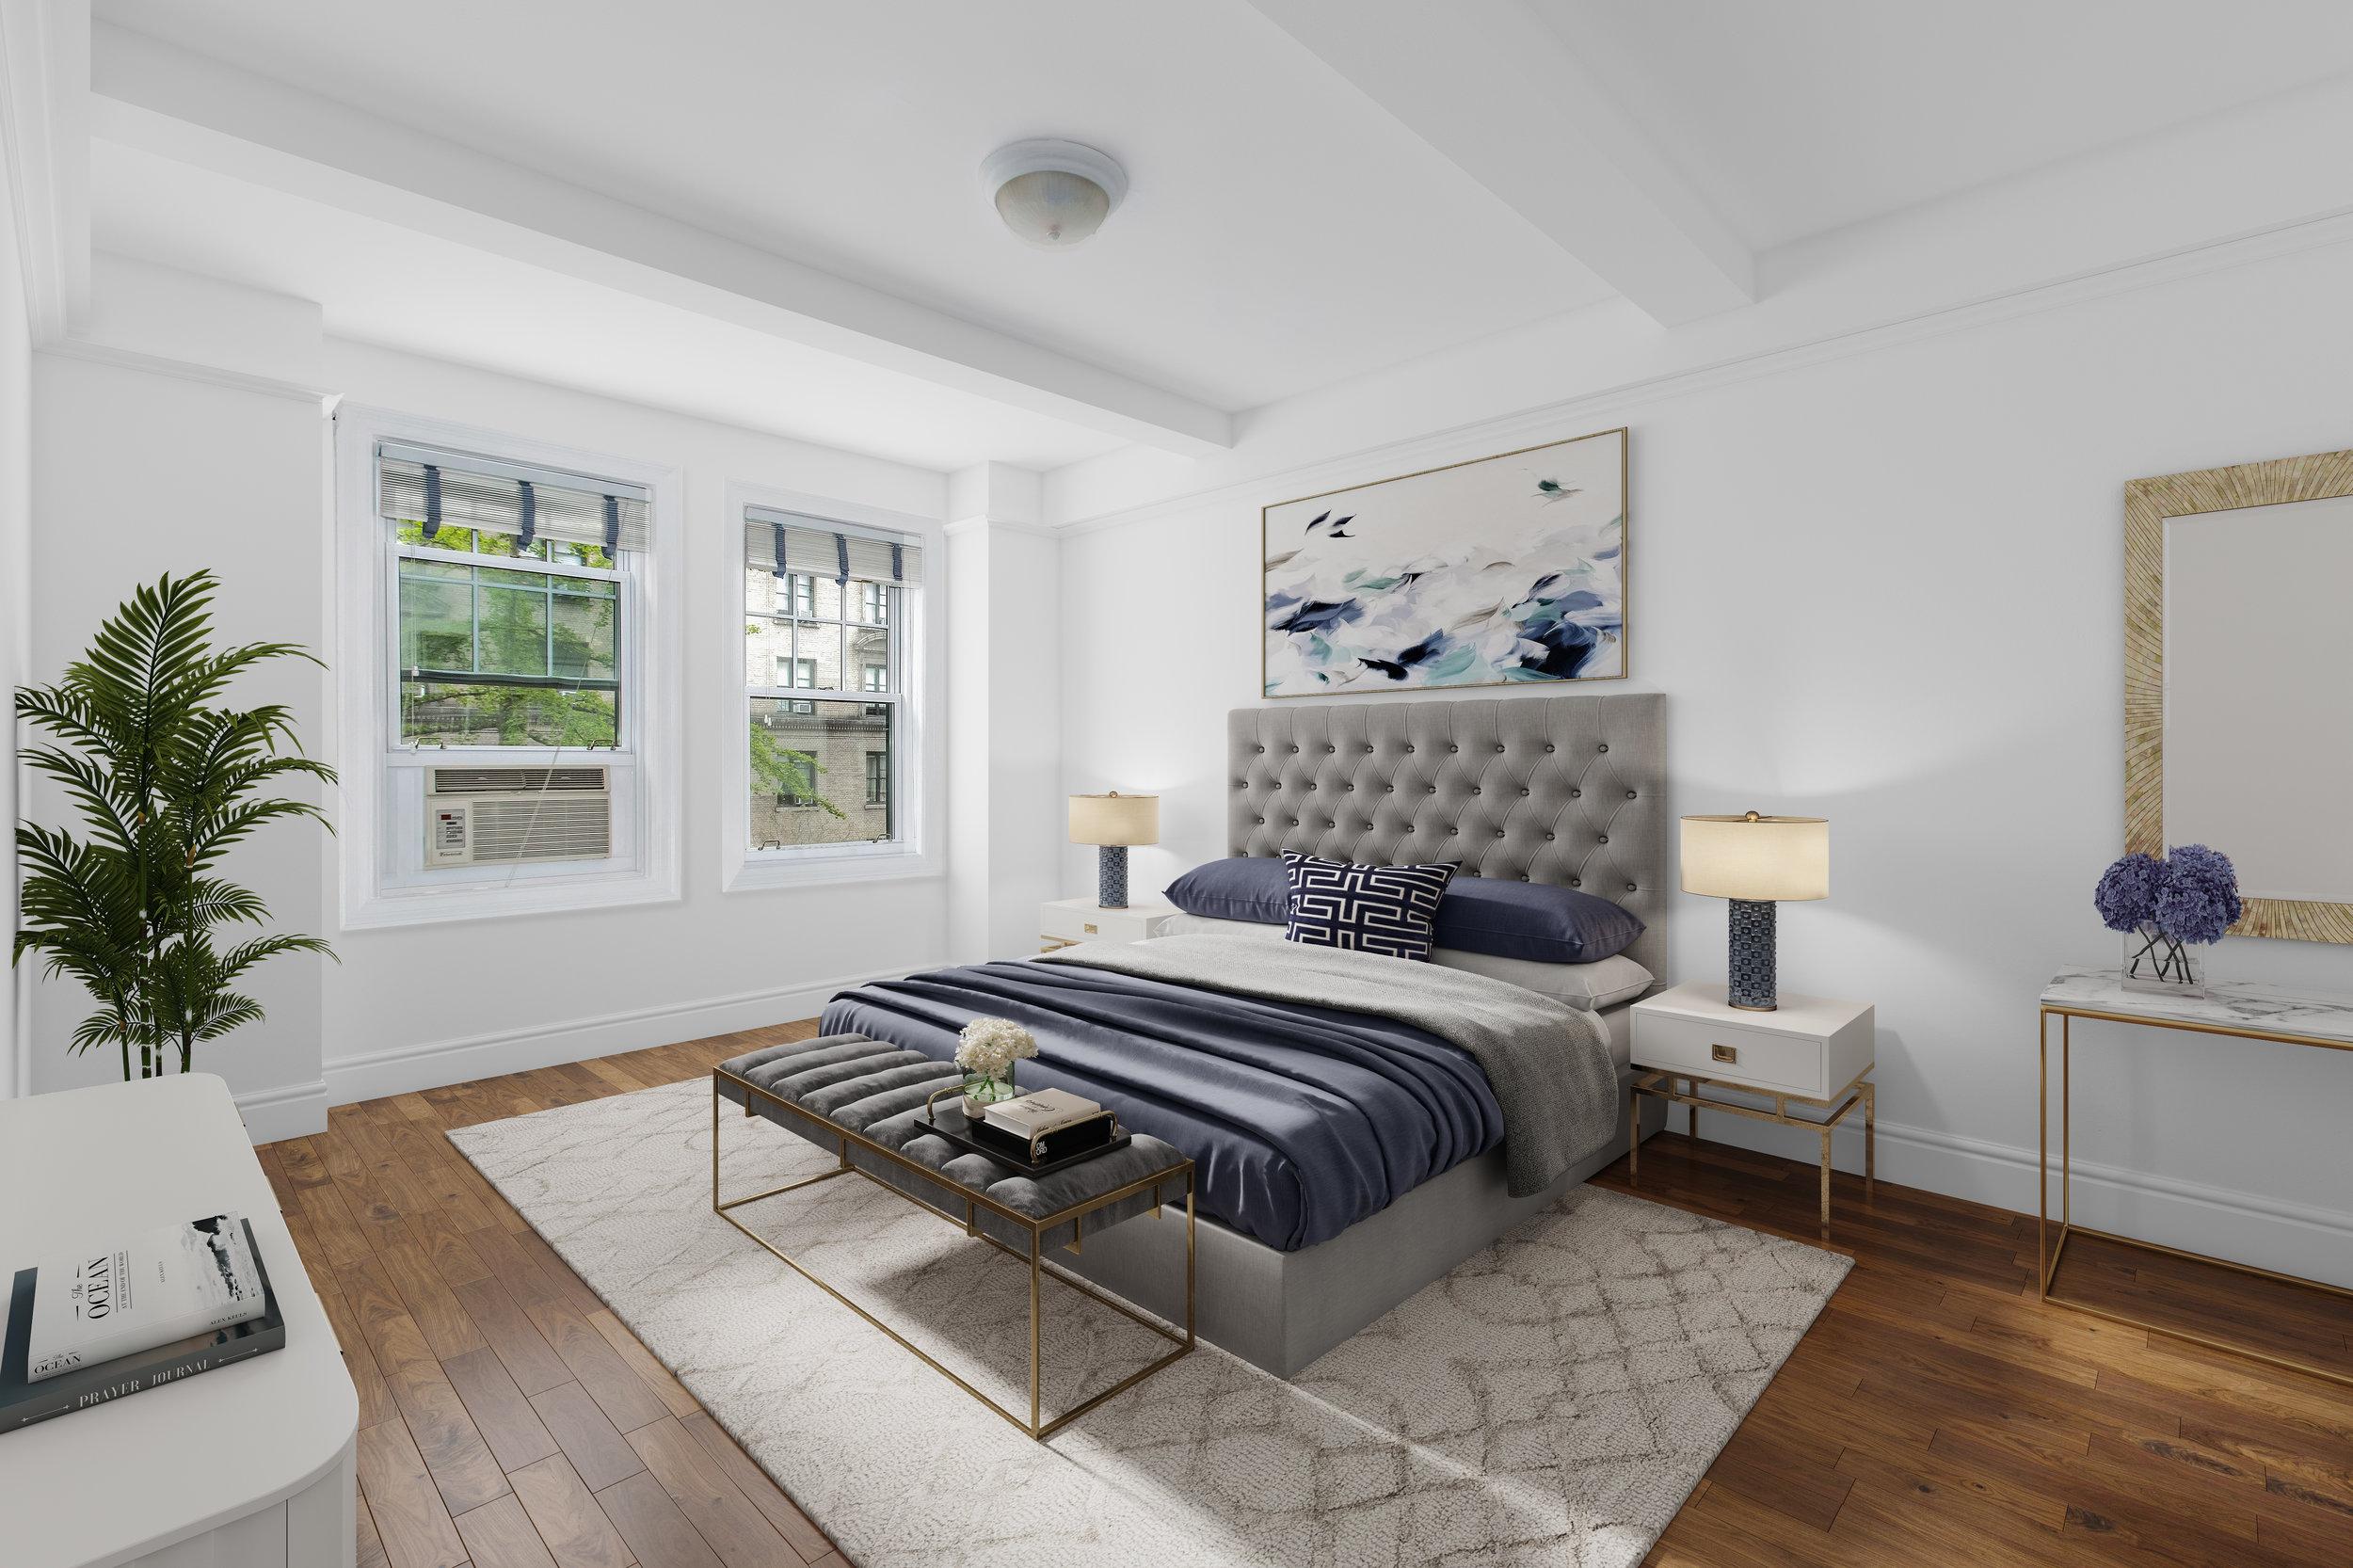 Andrew_685 WEA Apt 48_Second bedroom_staged_MJ.jpg